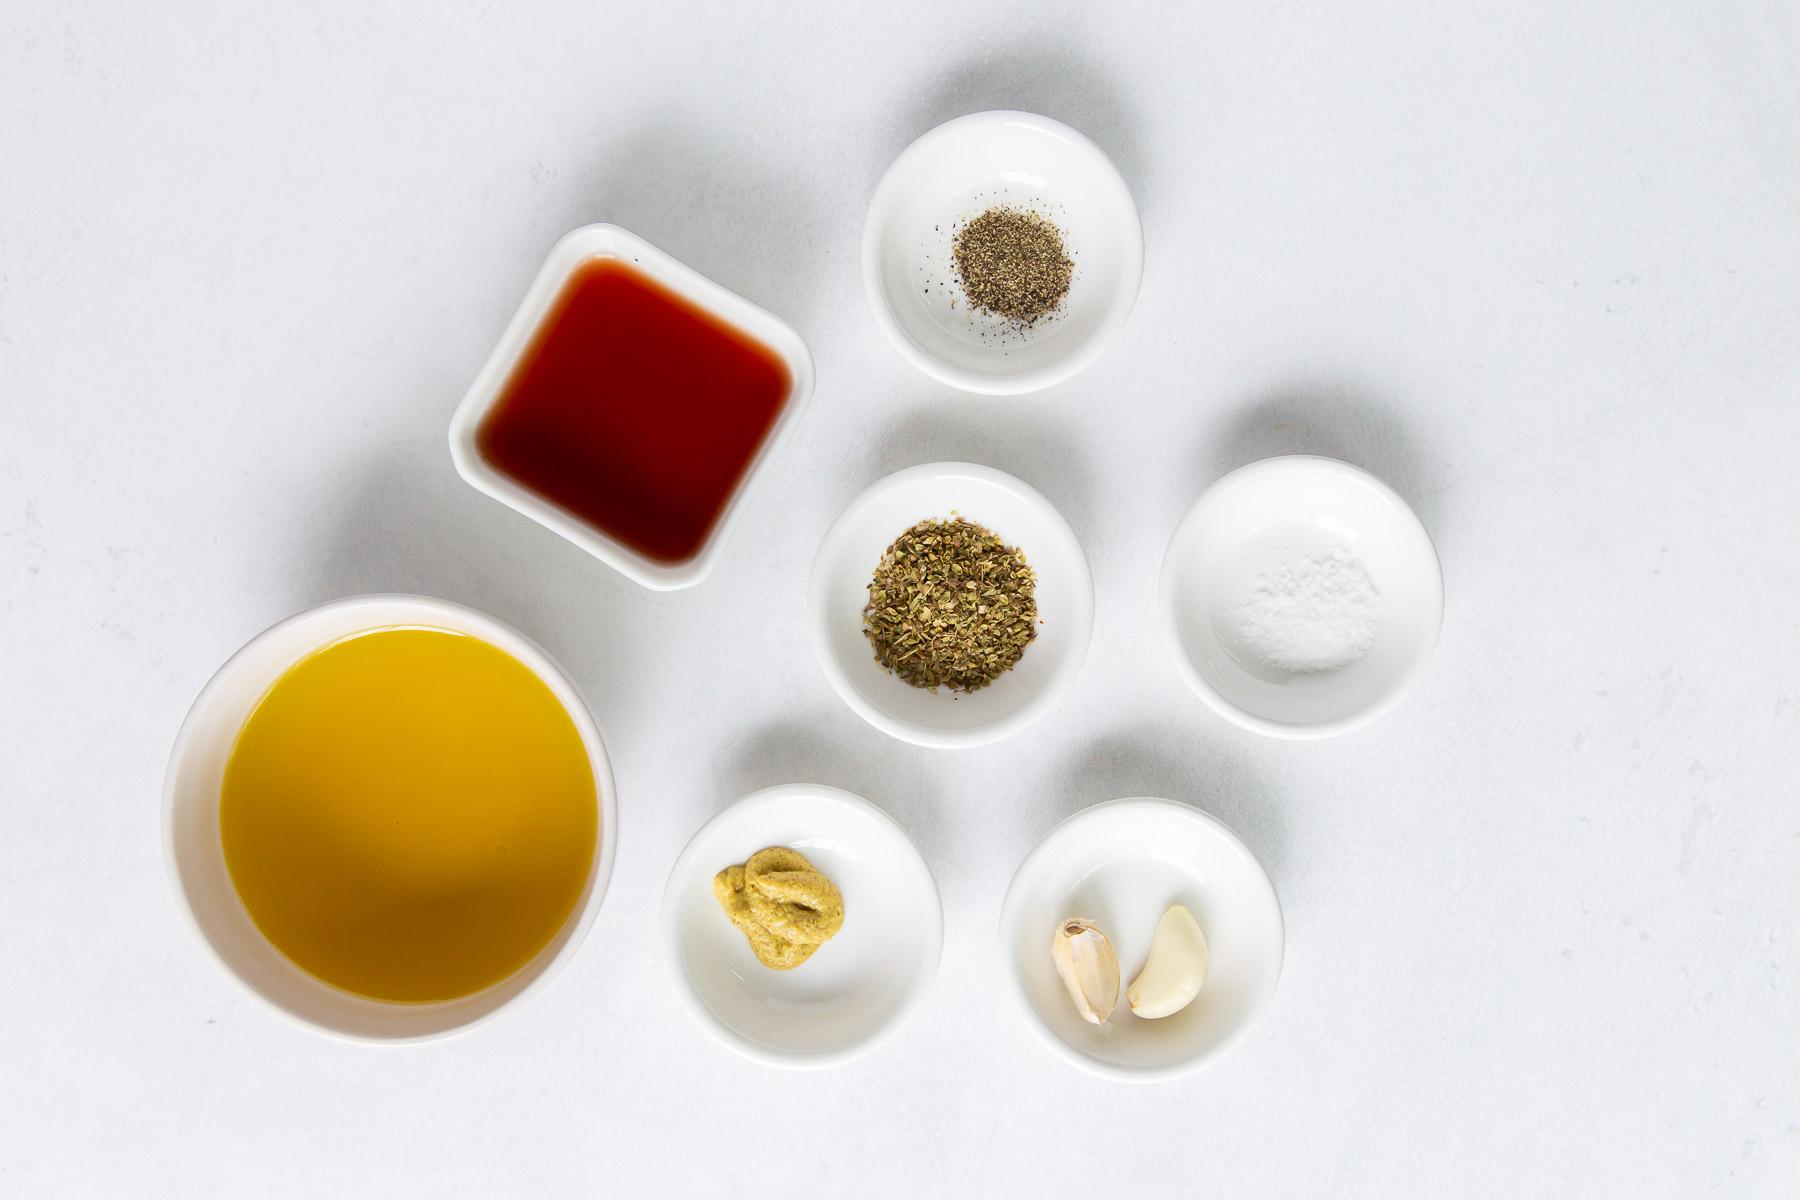 ingredients for greek salad dressing recipe